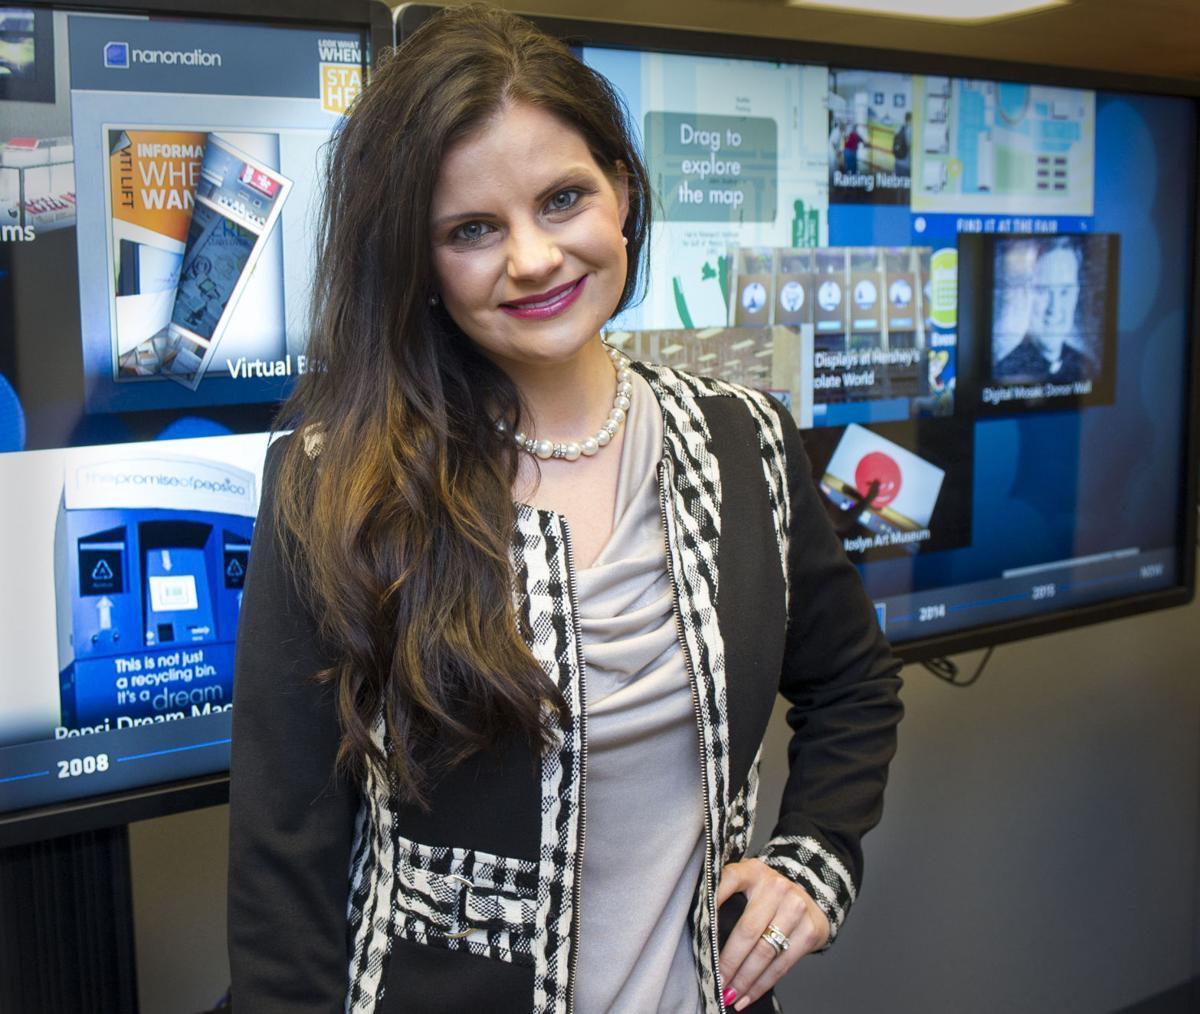 AshLea Allberry, VP at Nanonation